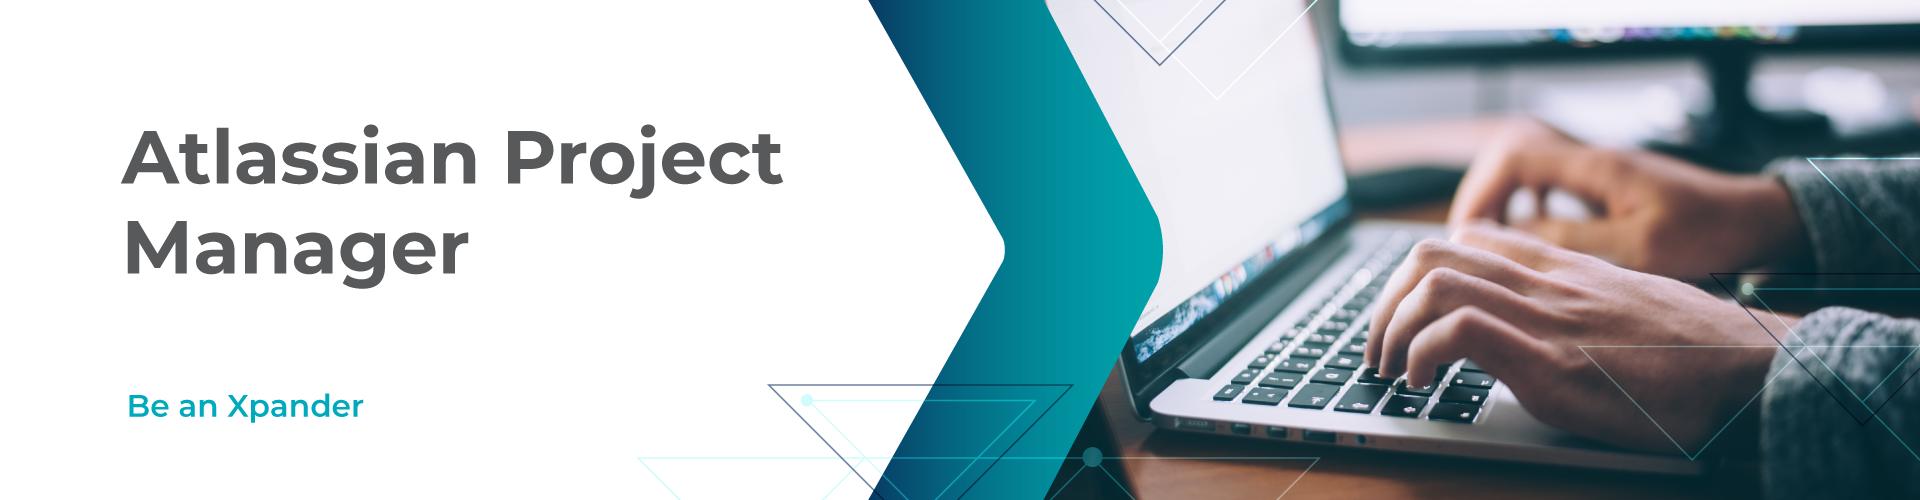 Oportunidade de emprego Atlassian Project Manager Xpand IT